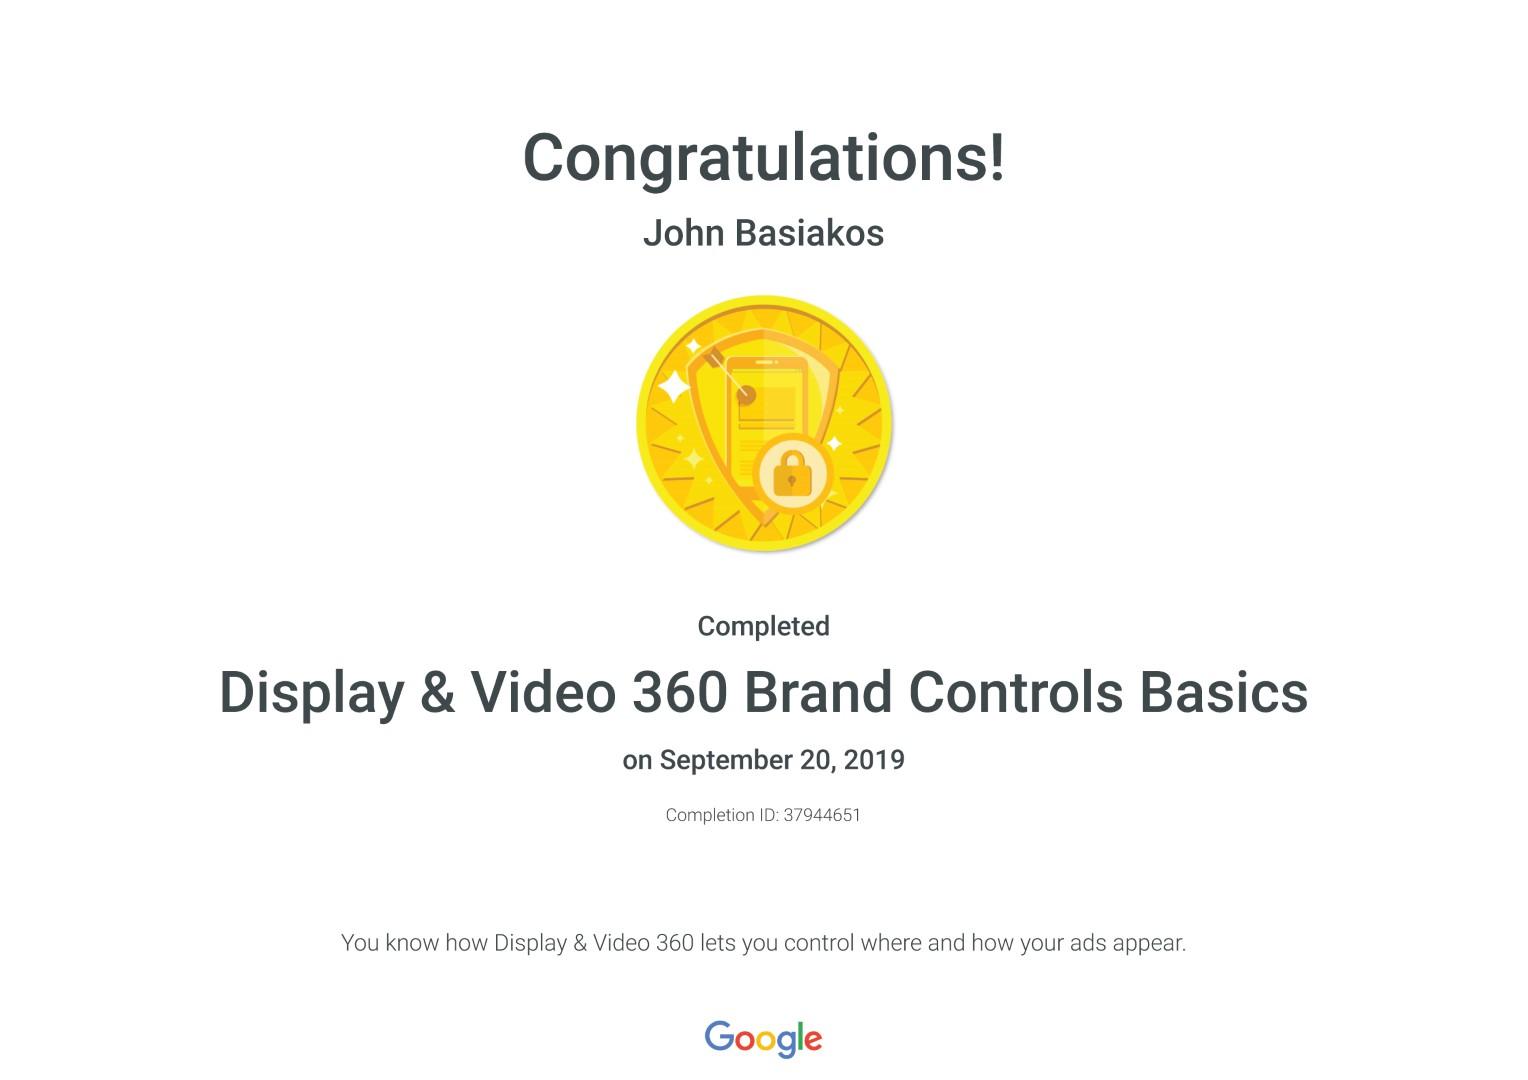 Display & Video 360 Brand Controls Basics _ Google